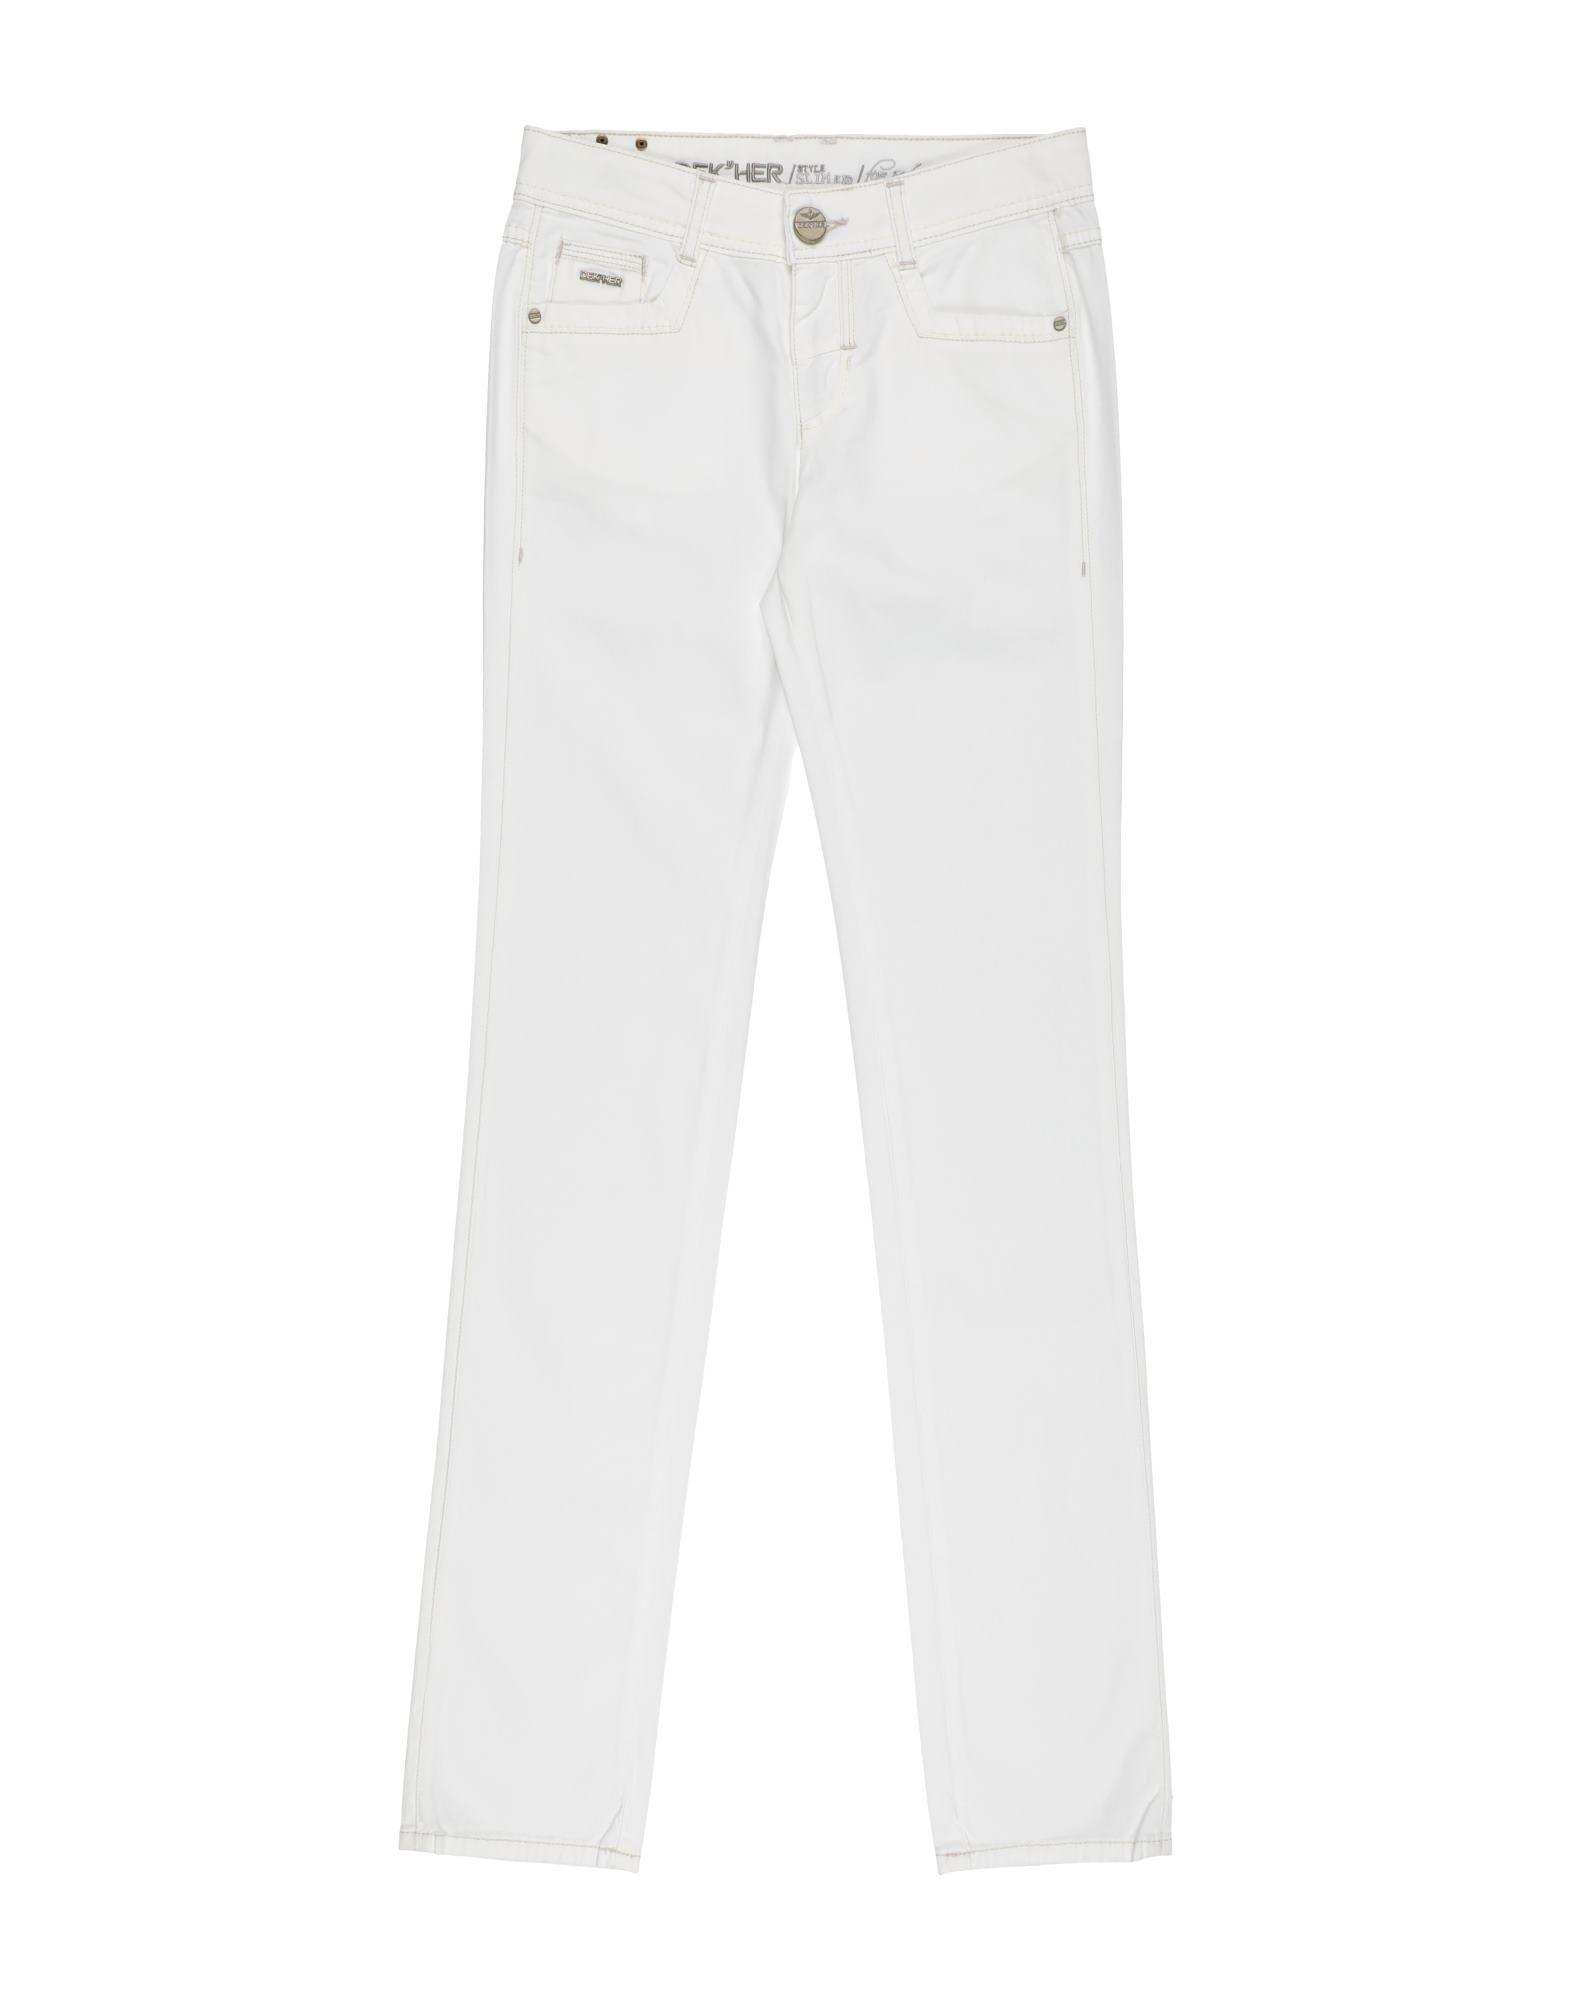 Dek'her Kids' Casual Pants In White